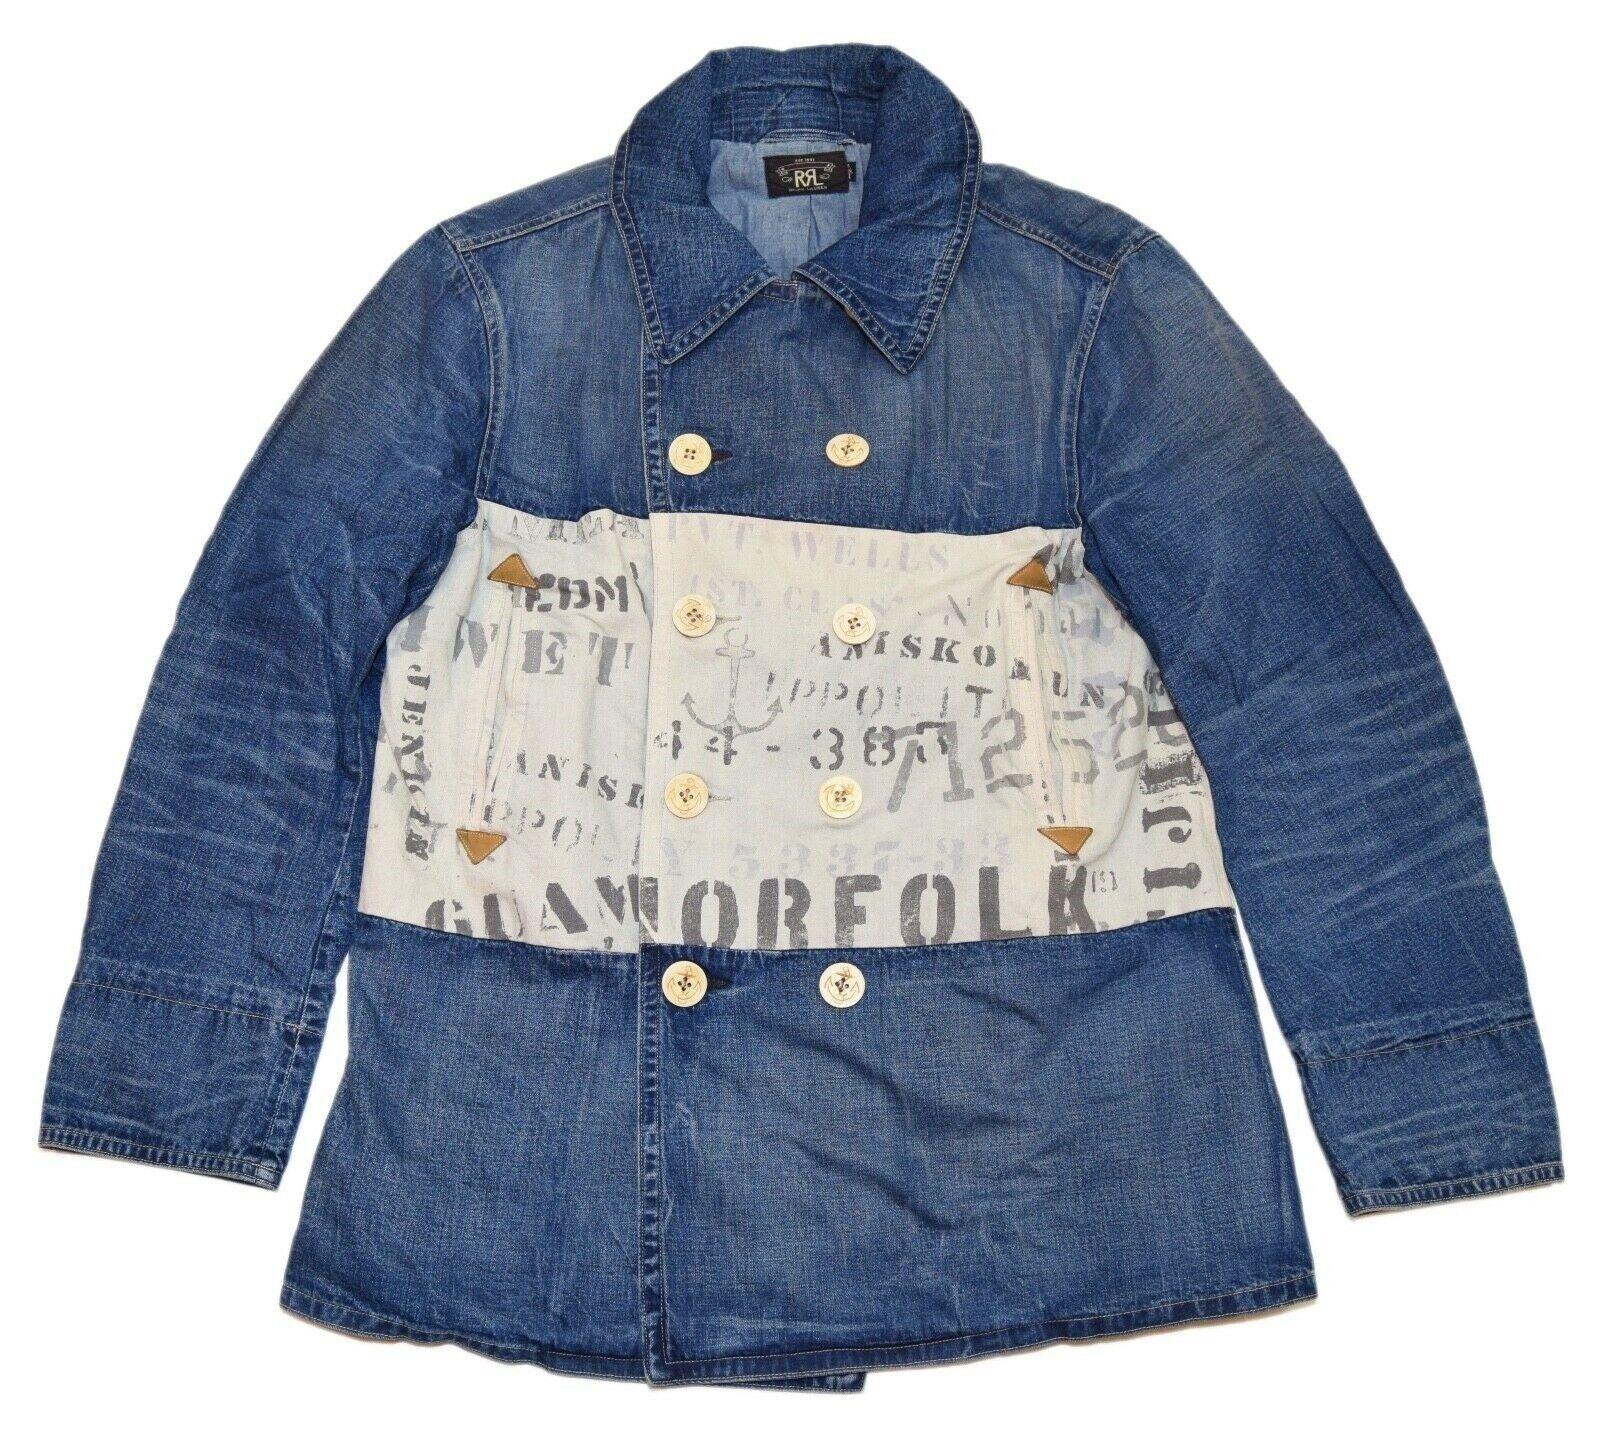 995-ralph-lauren-rrl-mens-nautical-peacoat-denim-jacket-pea-coat-usa-blue-large